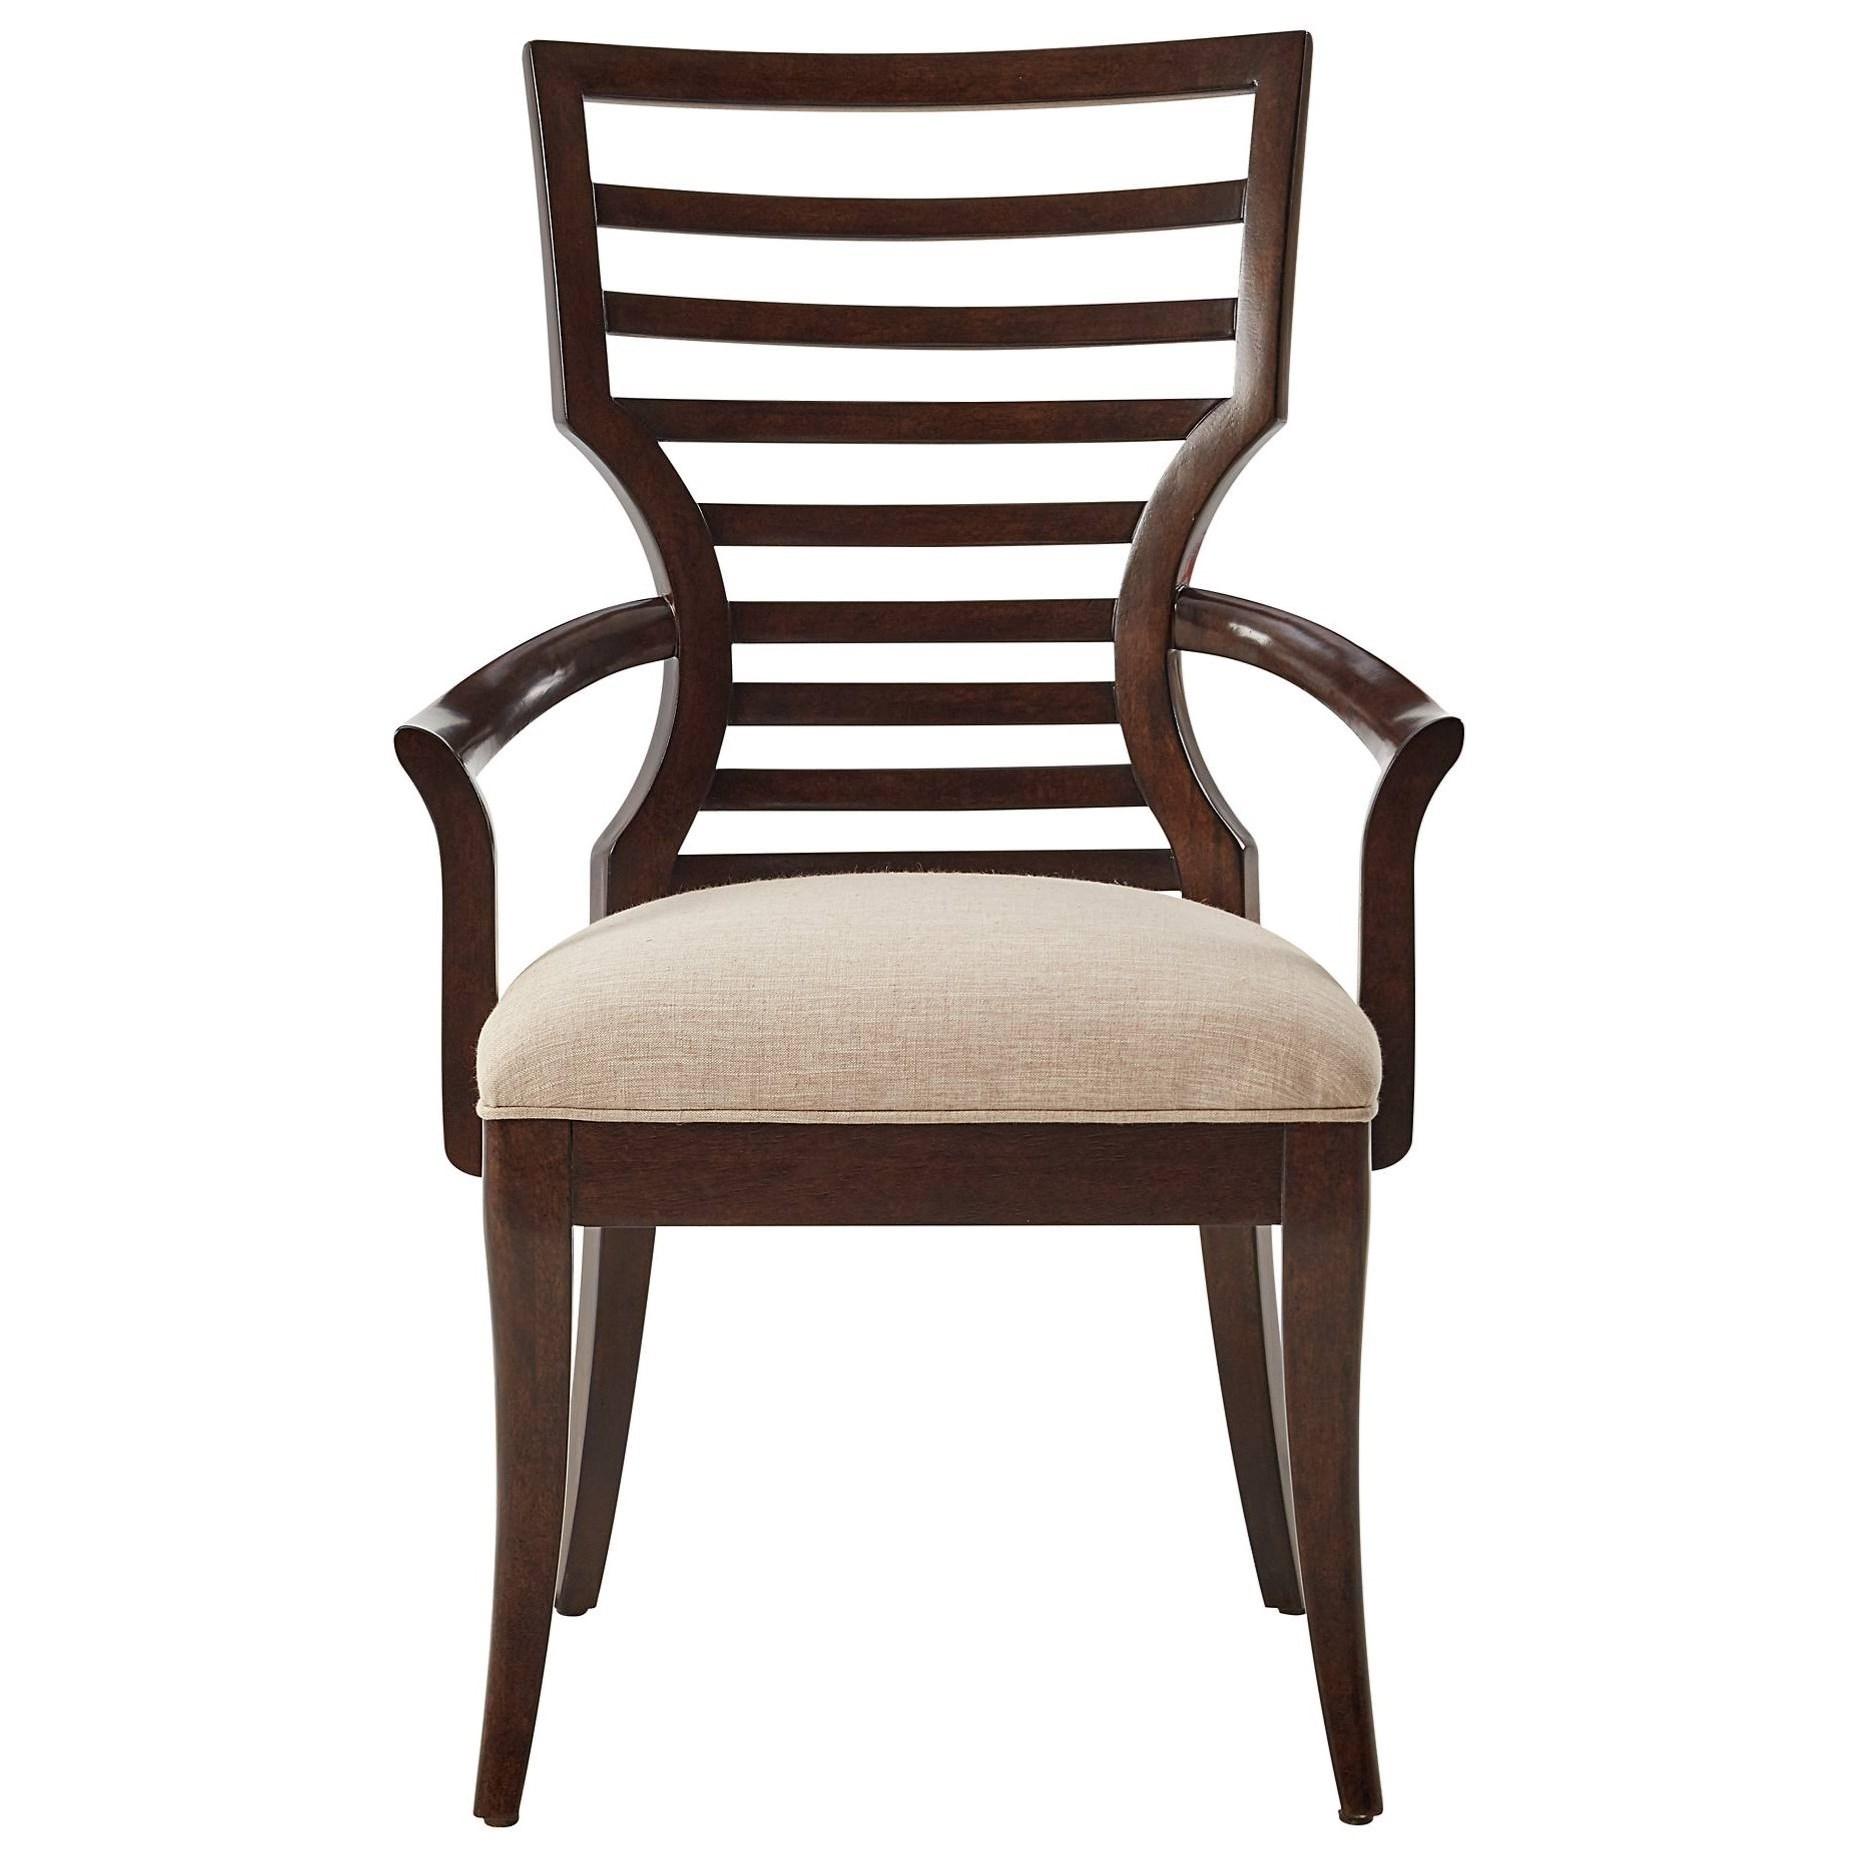 Stanley Furniture Virage Arm Chair - Item Number: 696-11-70